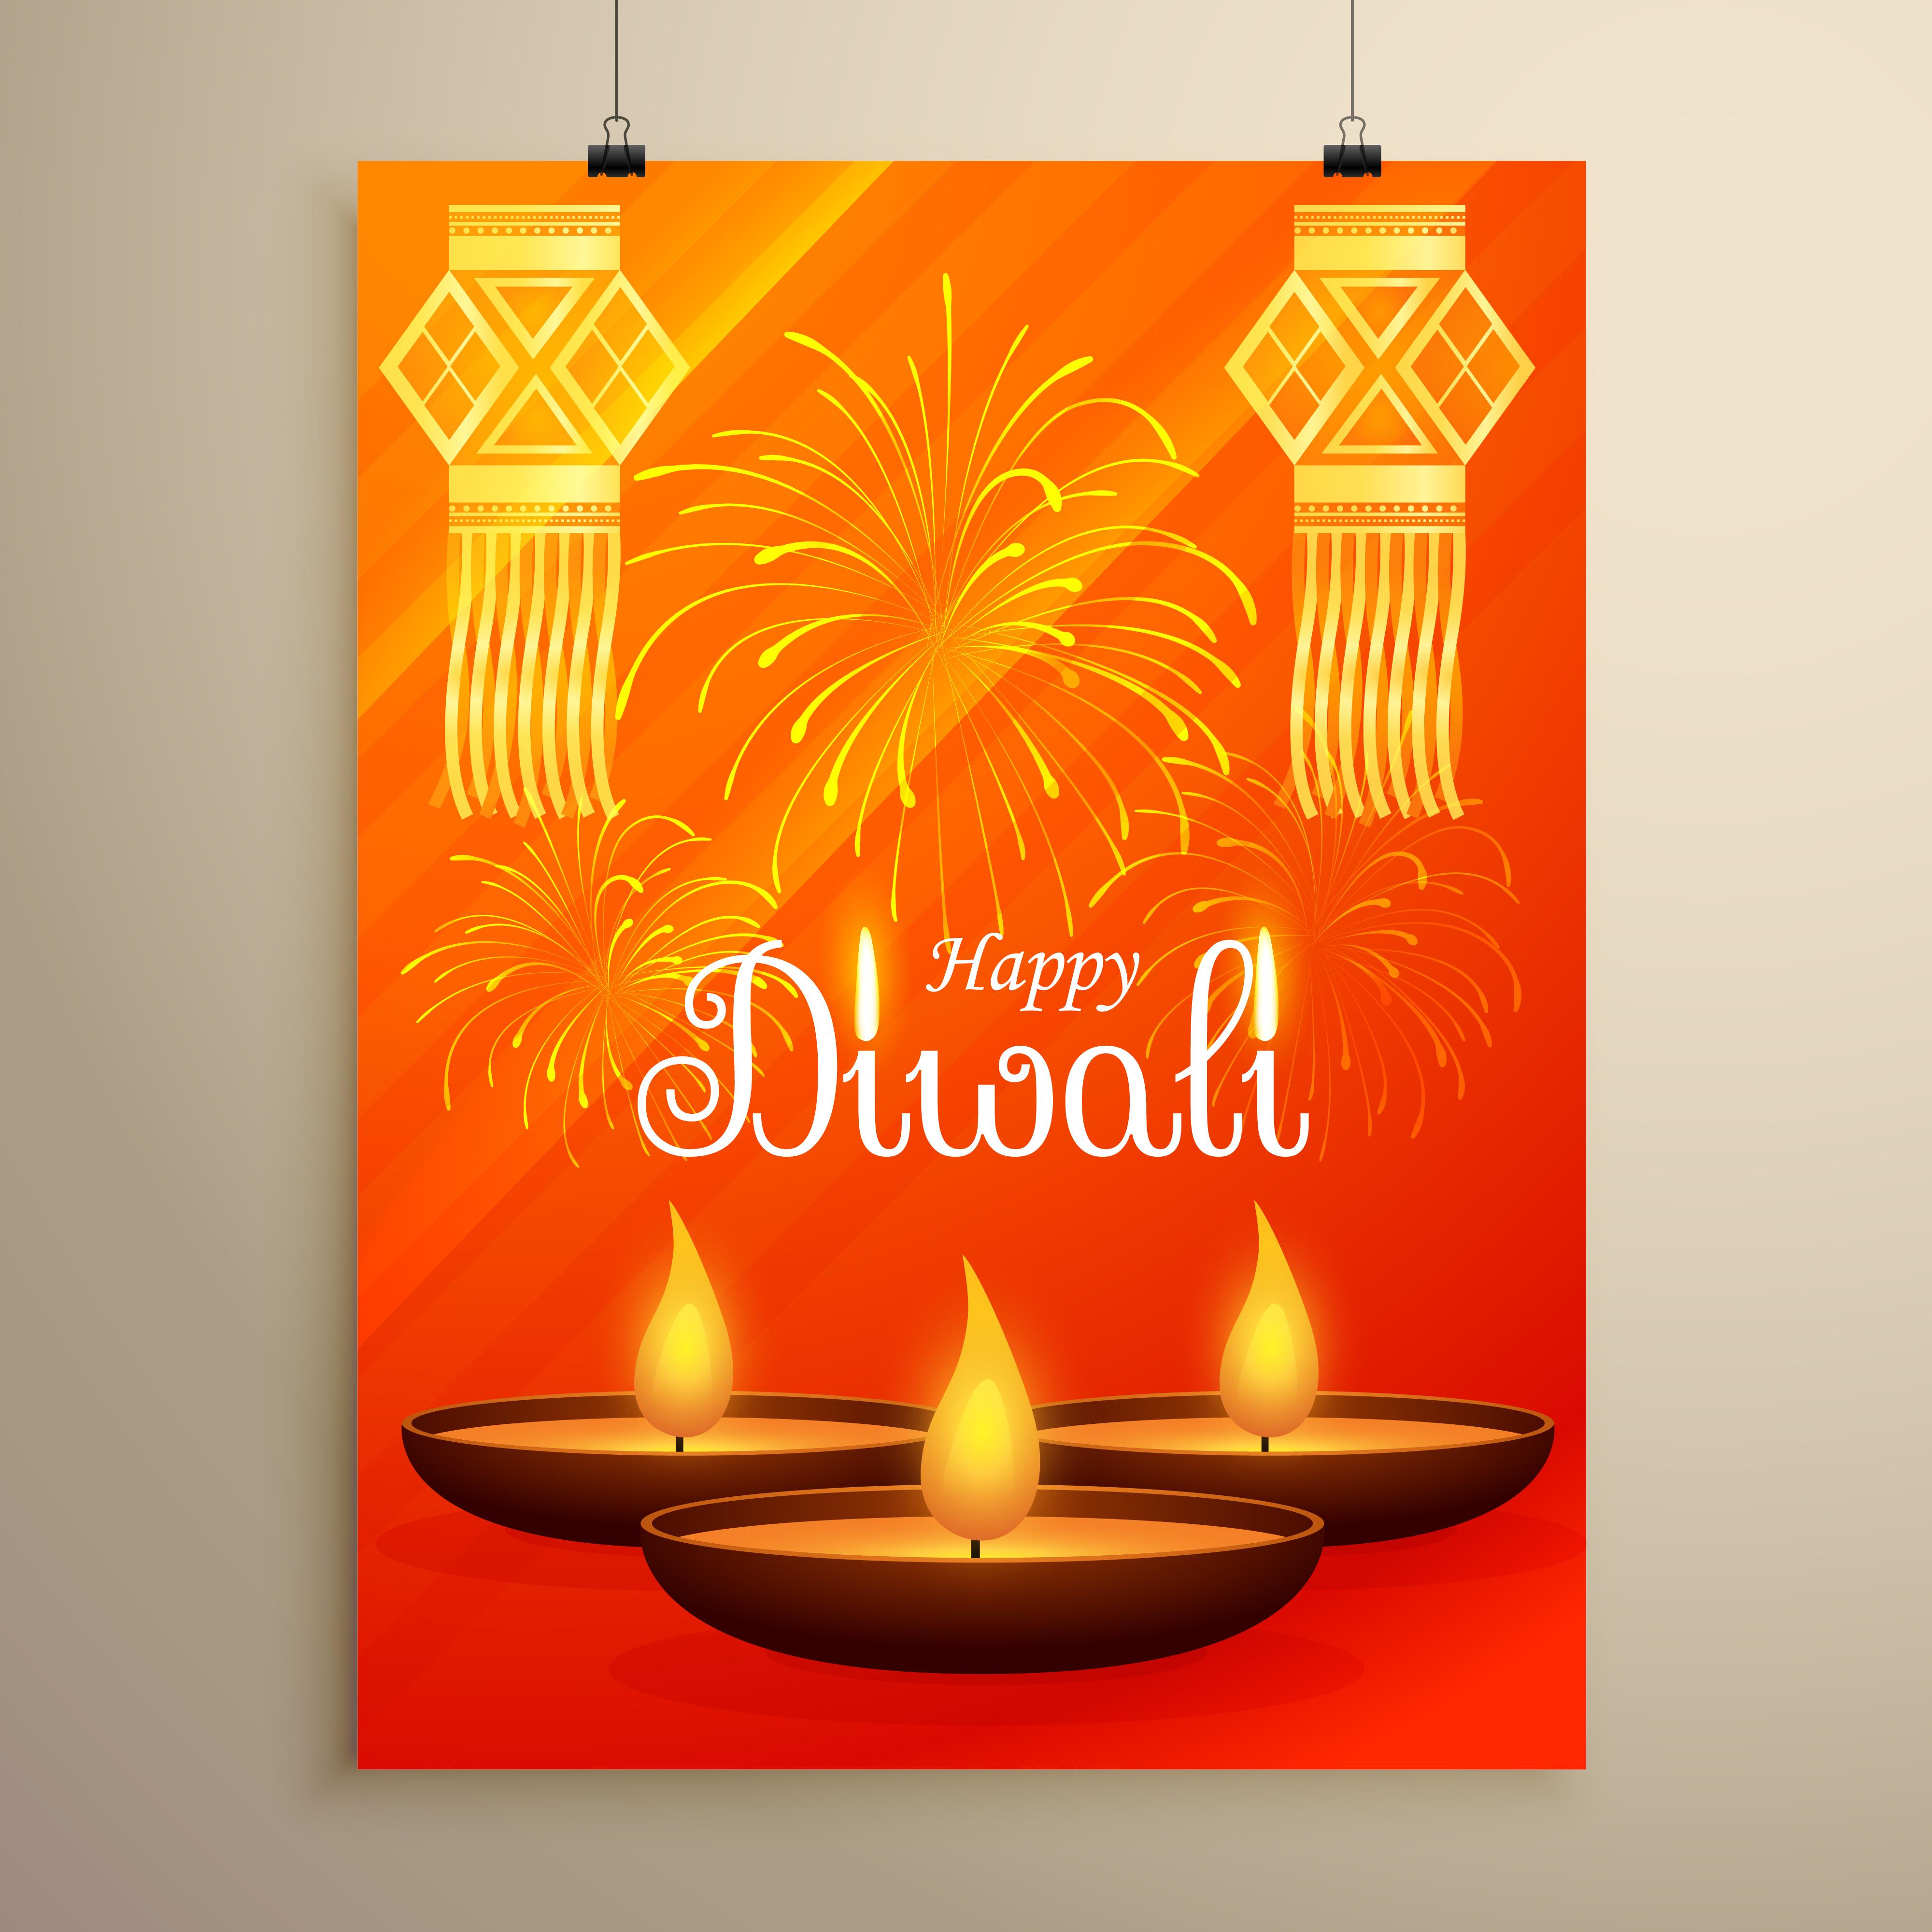 Diwali Festival Flyer Design With Diya Fireworks And